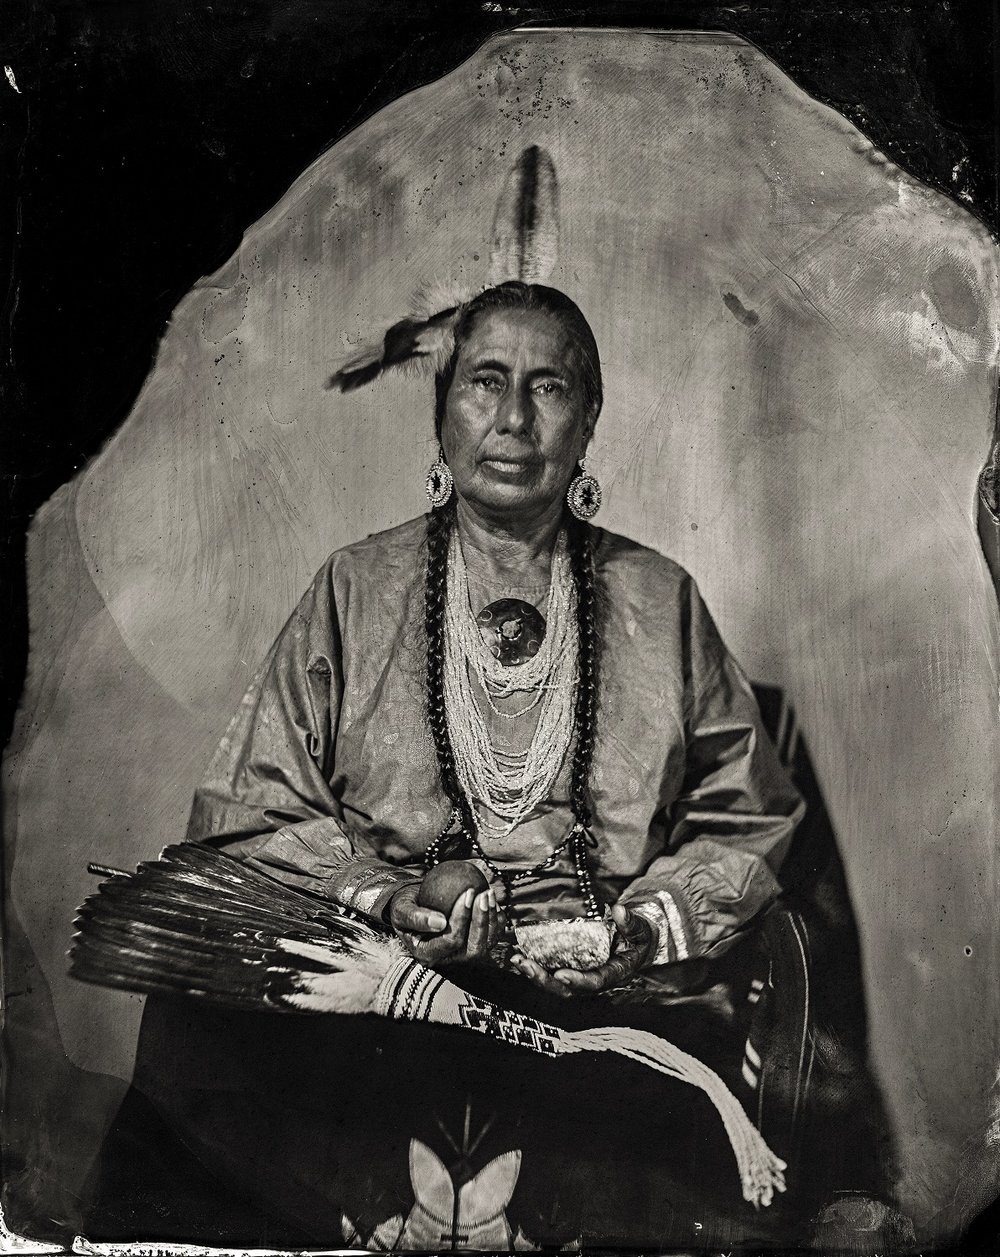 Will Wilson, Casey Camp Horinek, citizen of Ponca Tribe of Oklahoma, 2016